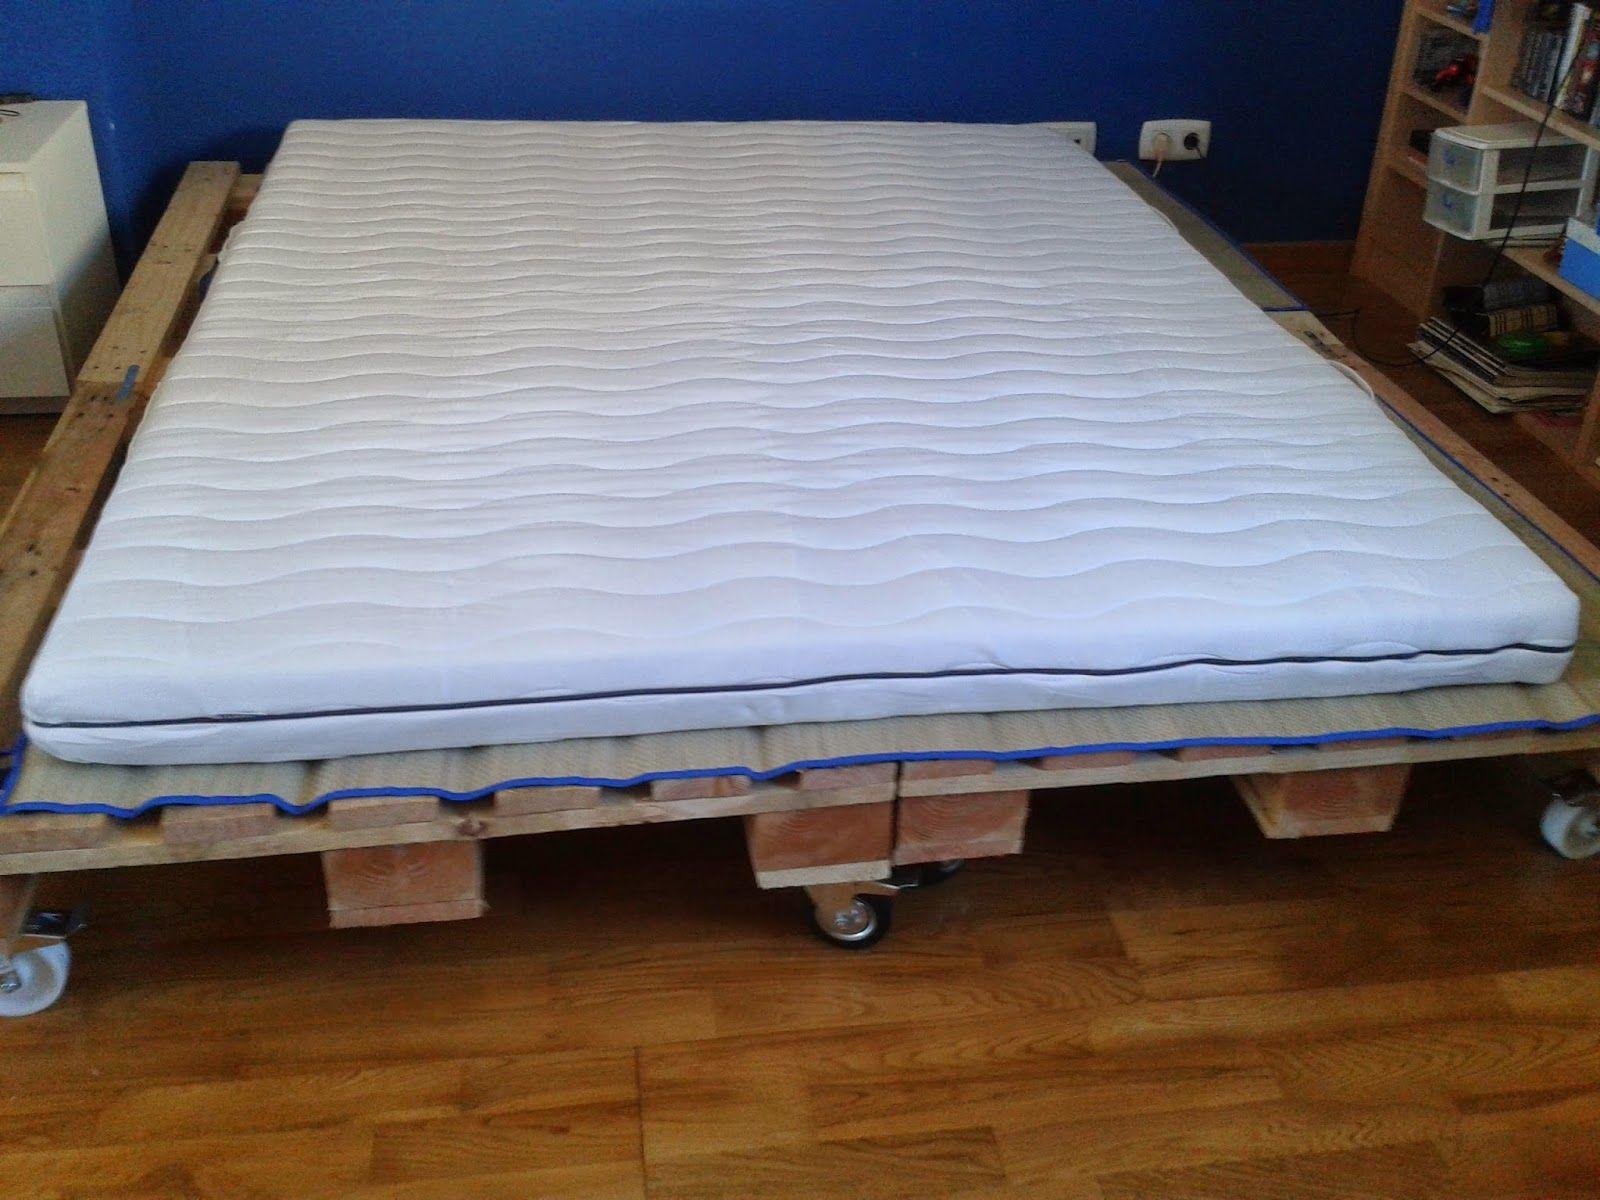 Taller de restauraci n lila diy cama de palets ideias for Tarimas de madera para cama